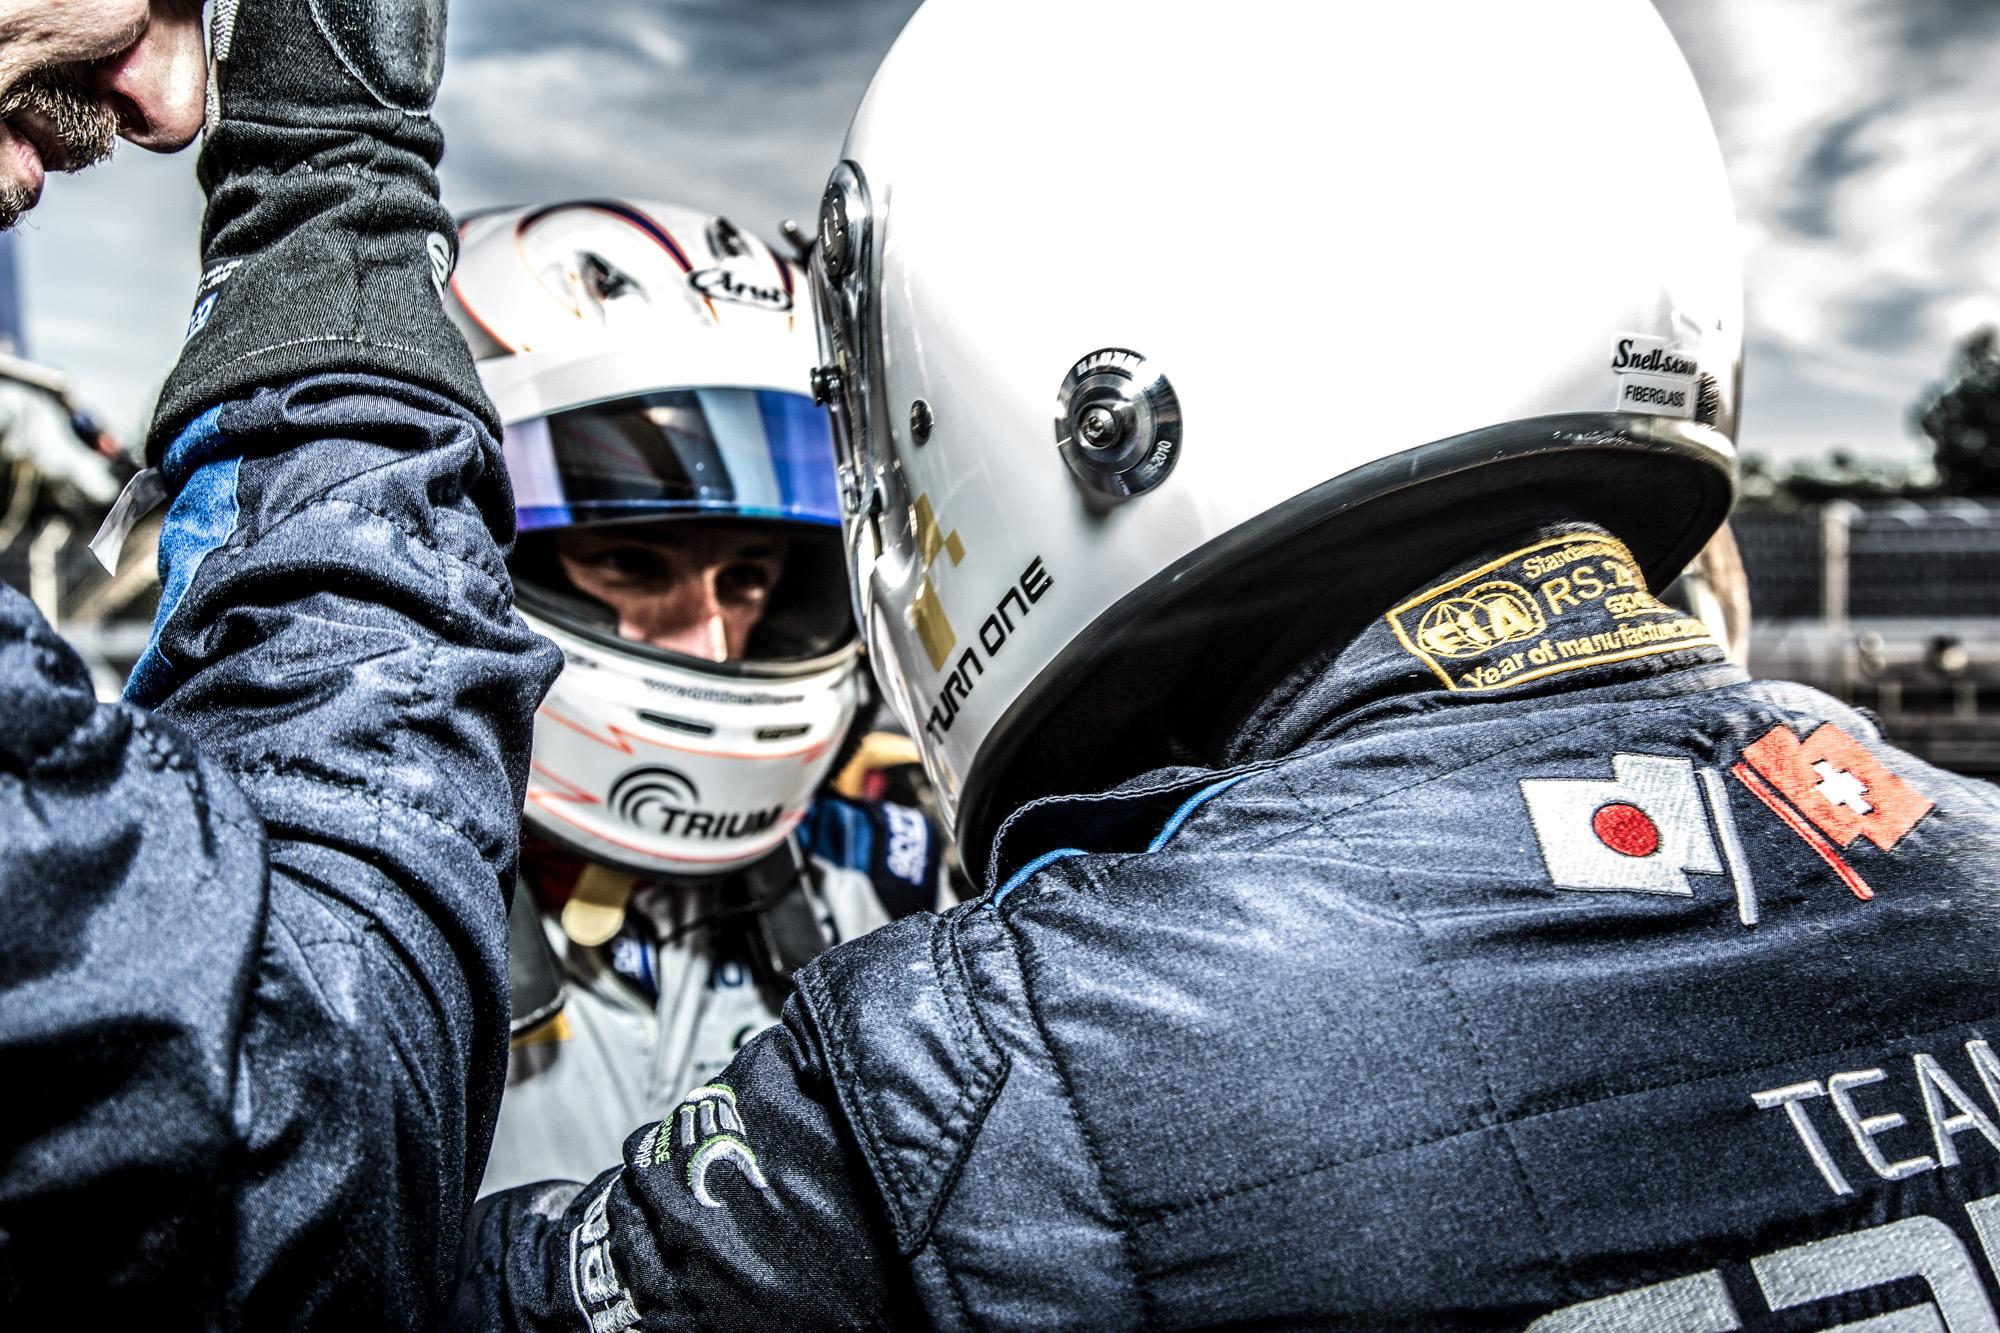 raceto24-9832.jpg